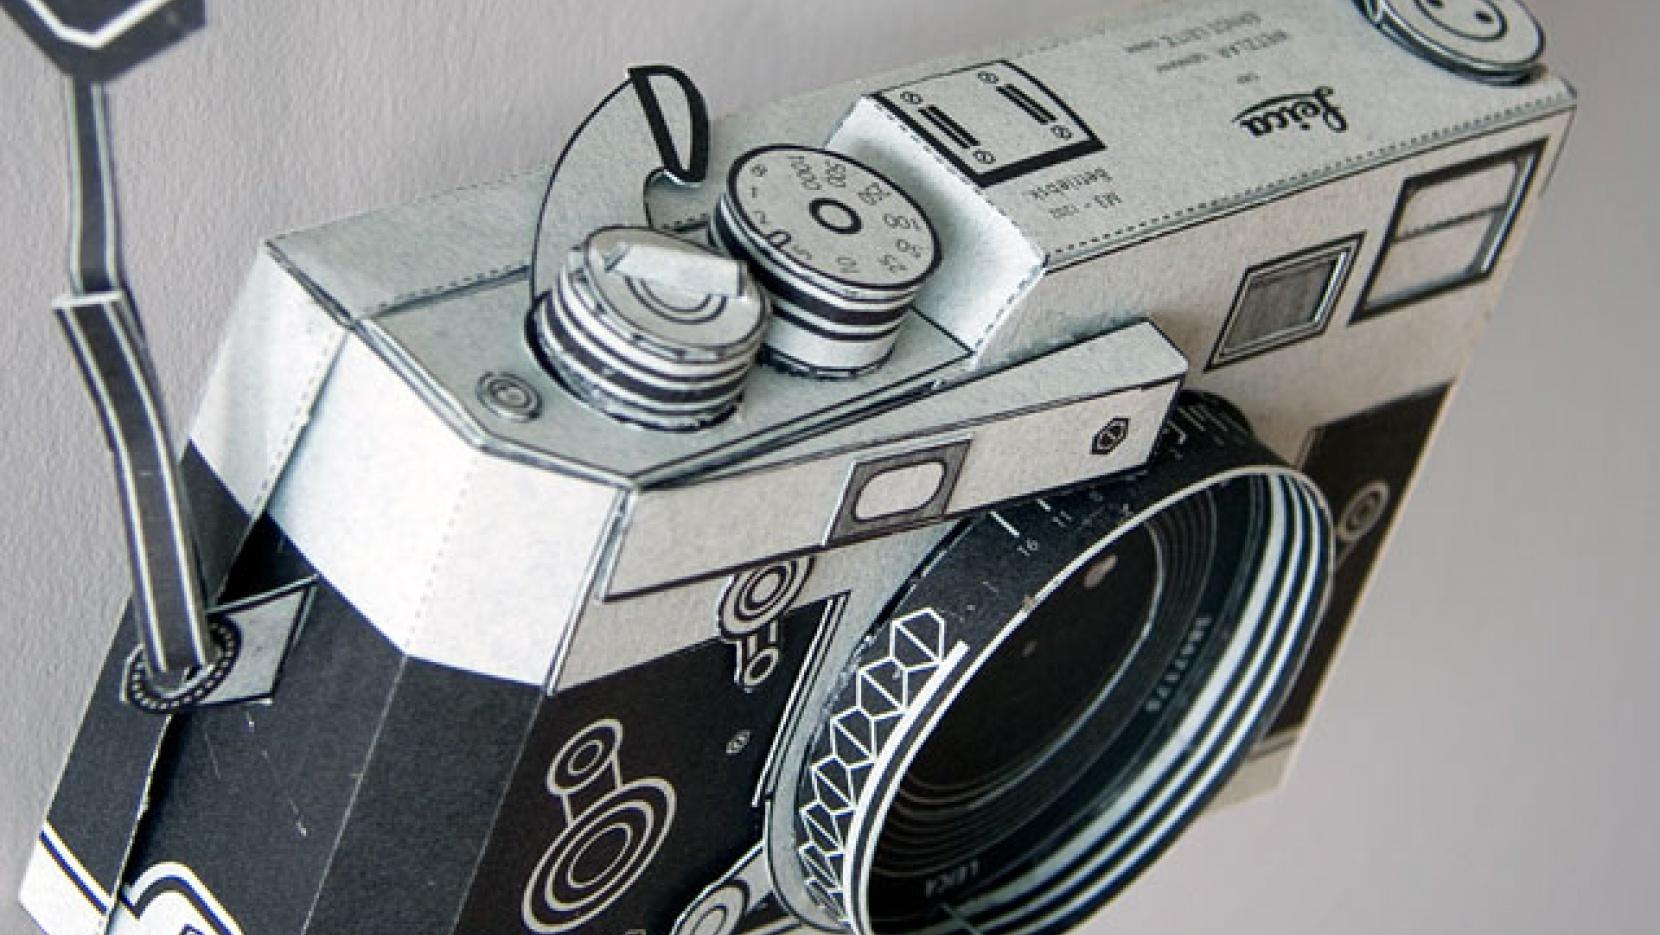 image regarding Camera Printable titled Printable Lie-ca M3 digicam through Matthew Nicholson Yatzer